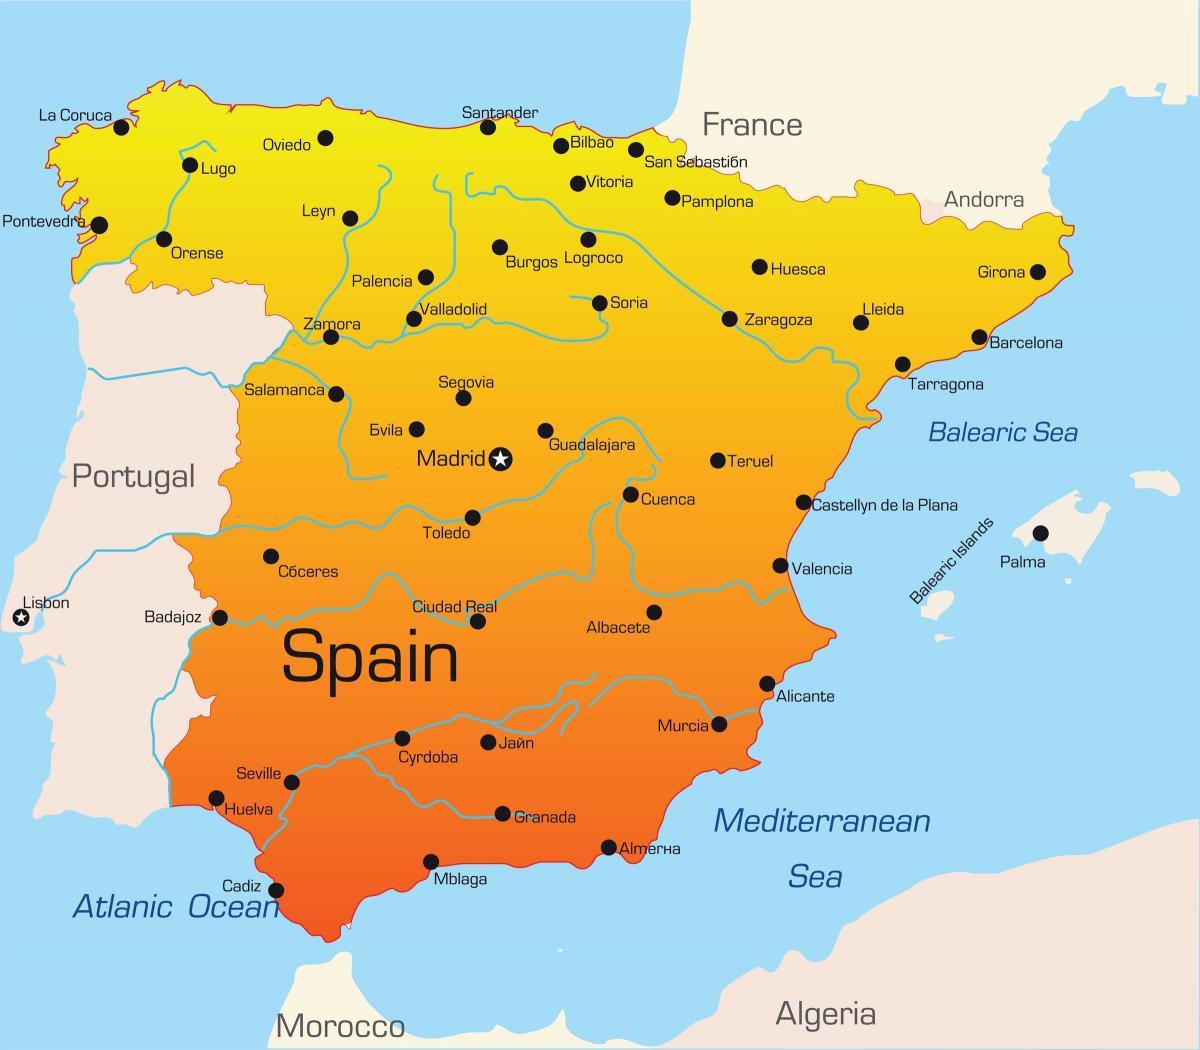 Karta Spanien Granada.Spanien Semester Destinationer Karta Resmalen I Spanien Karta